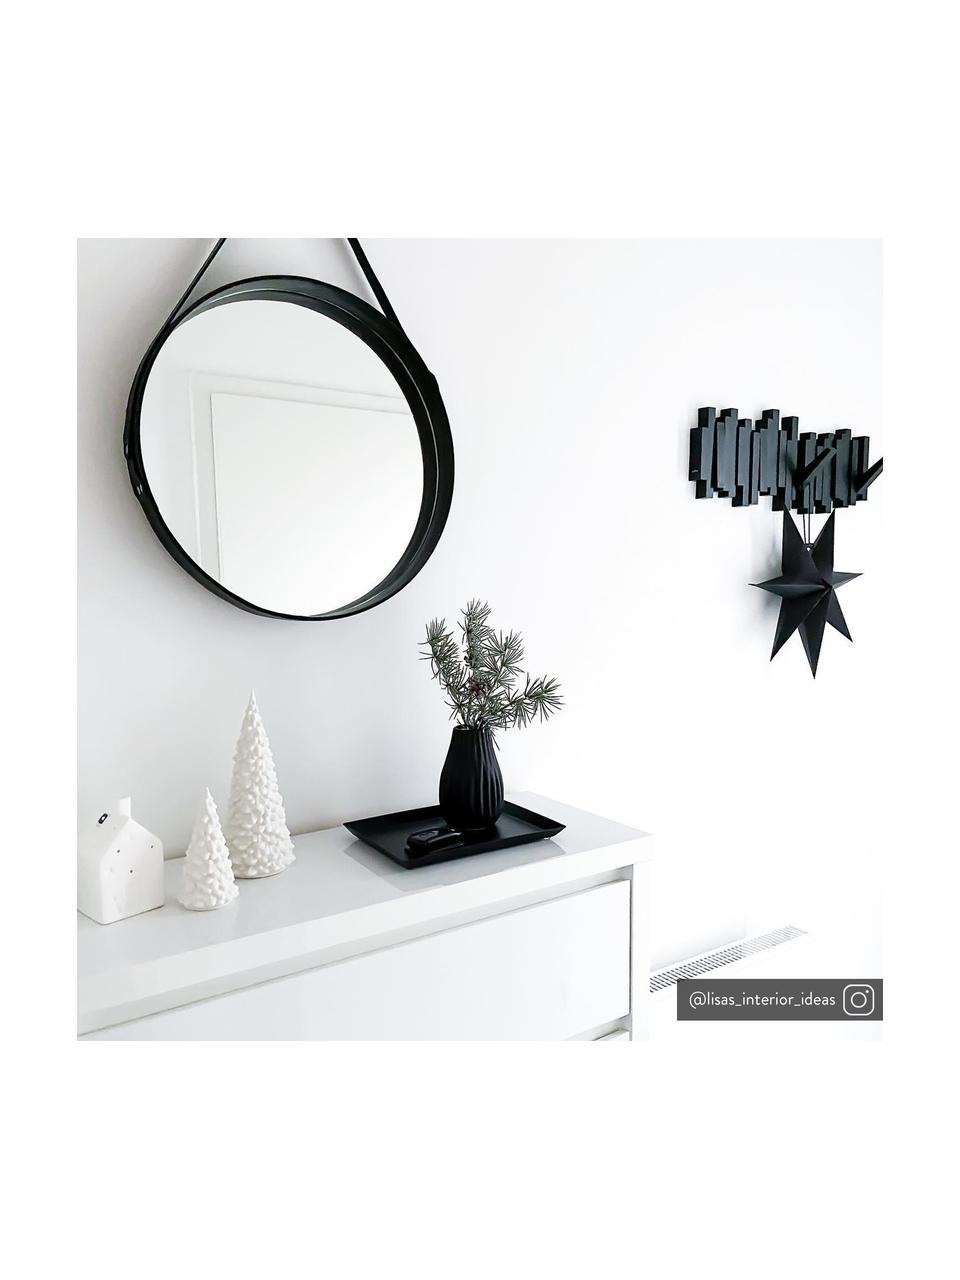 Ganci appendiabiti nero Sticks, Materiale sintetico, Nero, Larg. 48 x Alt. 18 cm